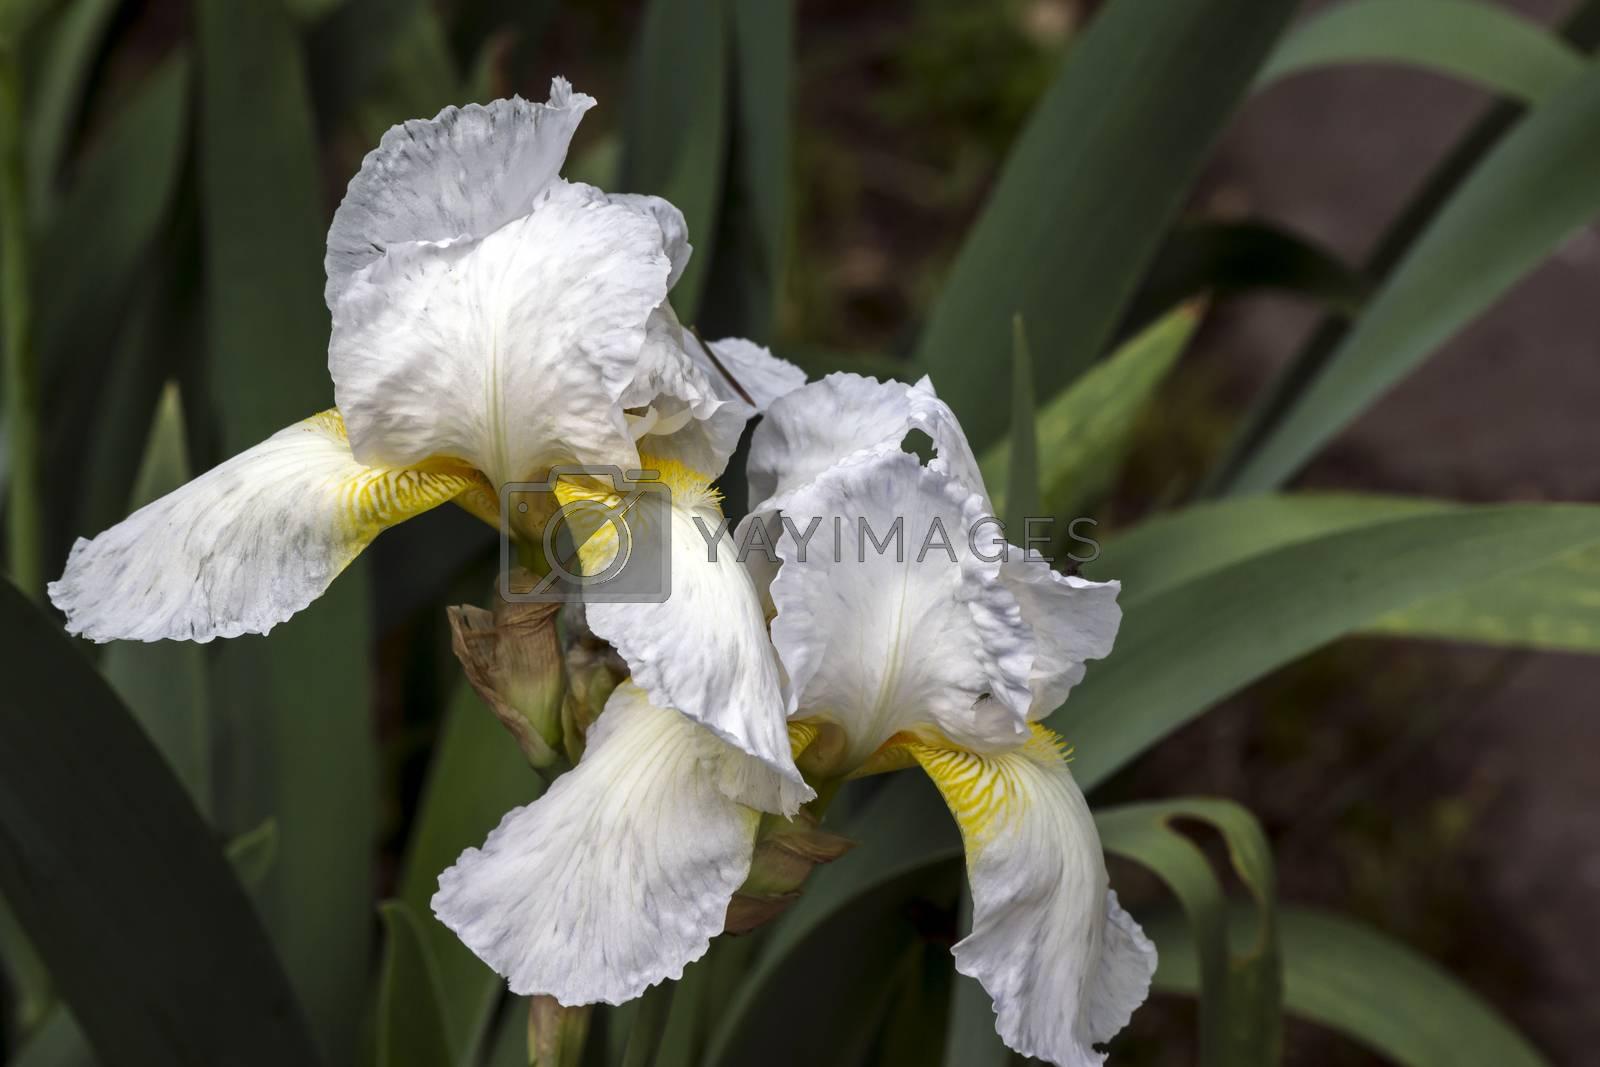 The spring garden ornament in the iris flower.